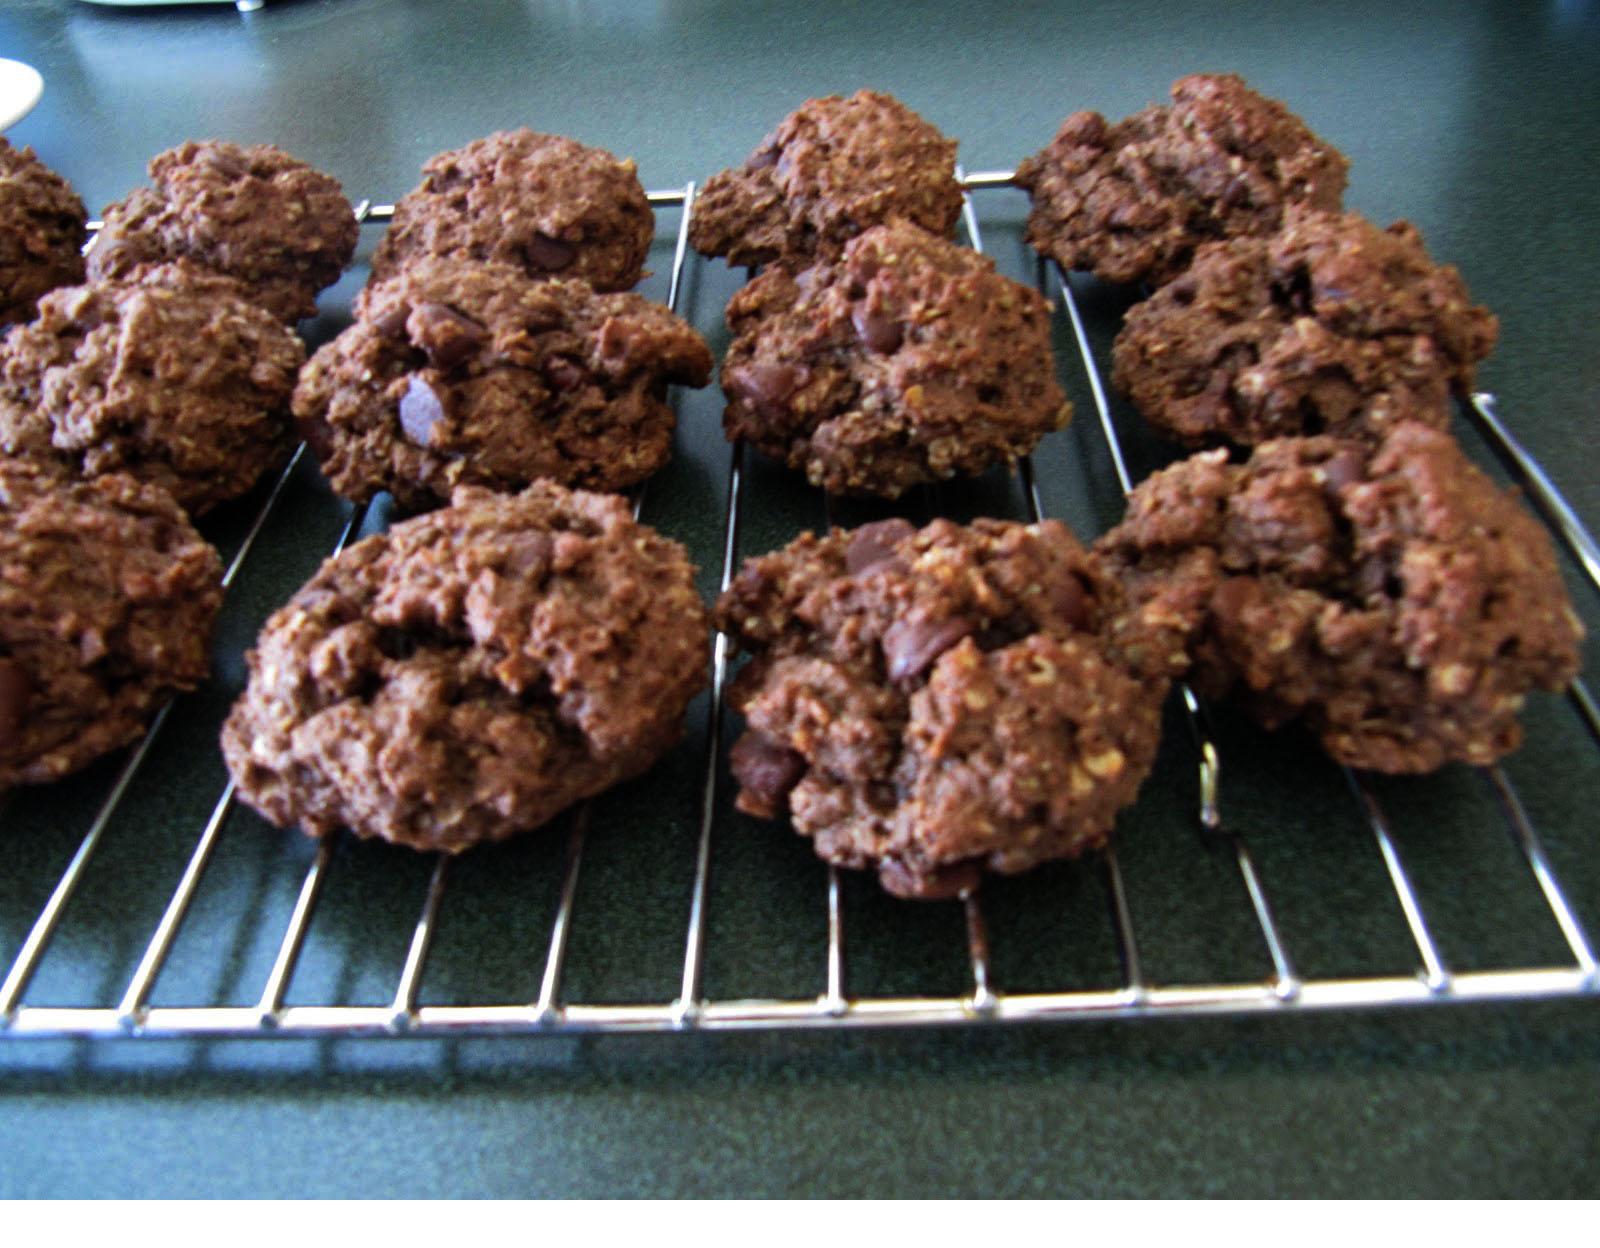 Cutler's Cookies: Double Chocolate Oatmeal Cookies